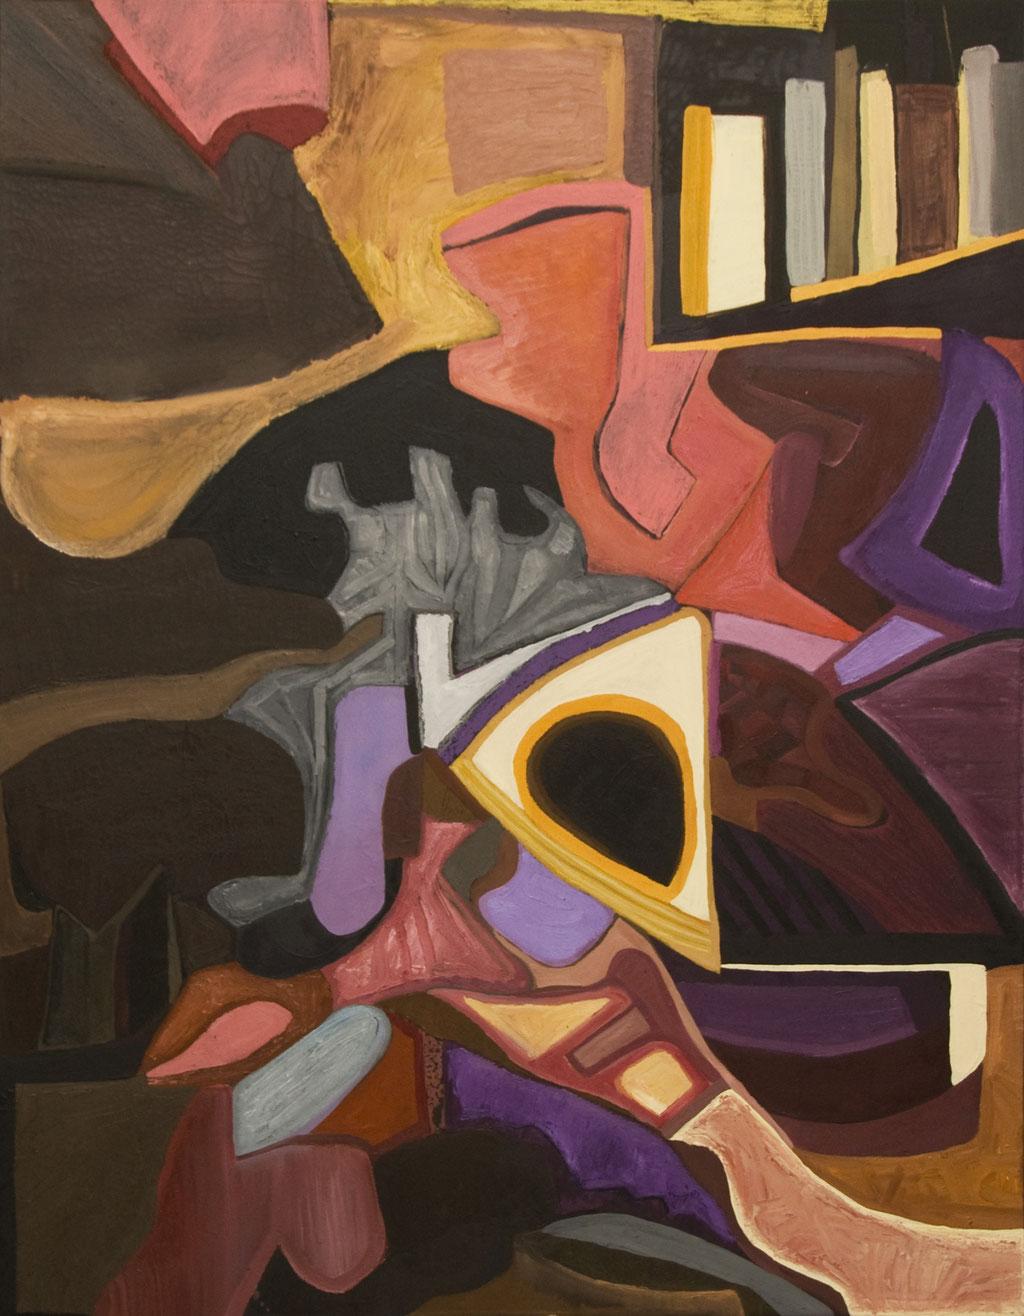 'Mambo Jambo' oil on canvas, 2009 - SOLD